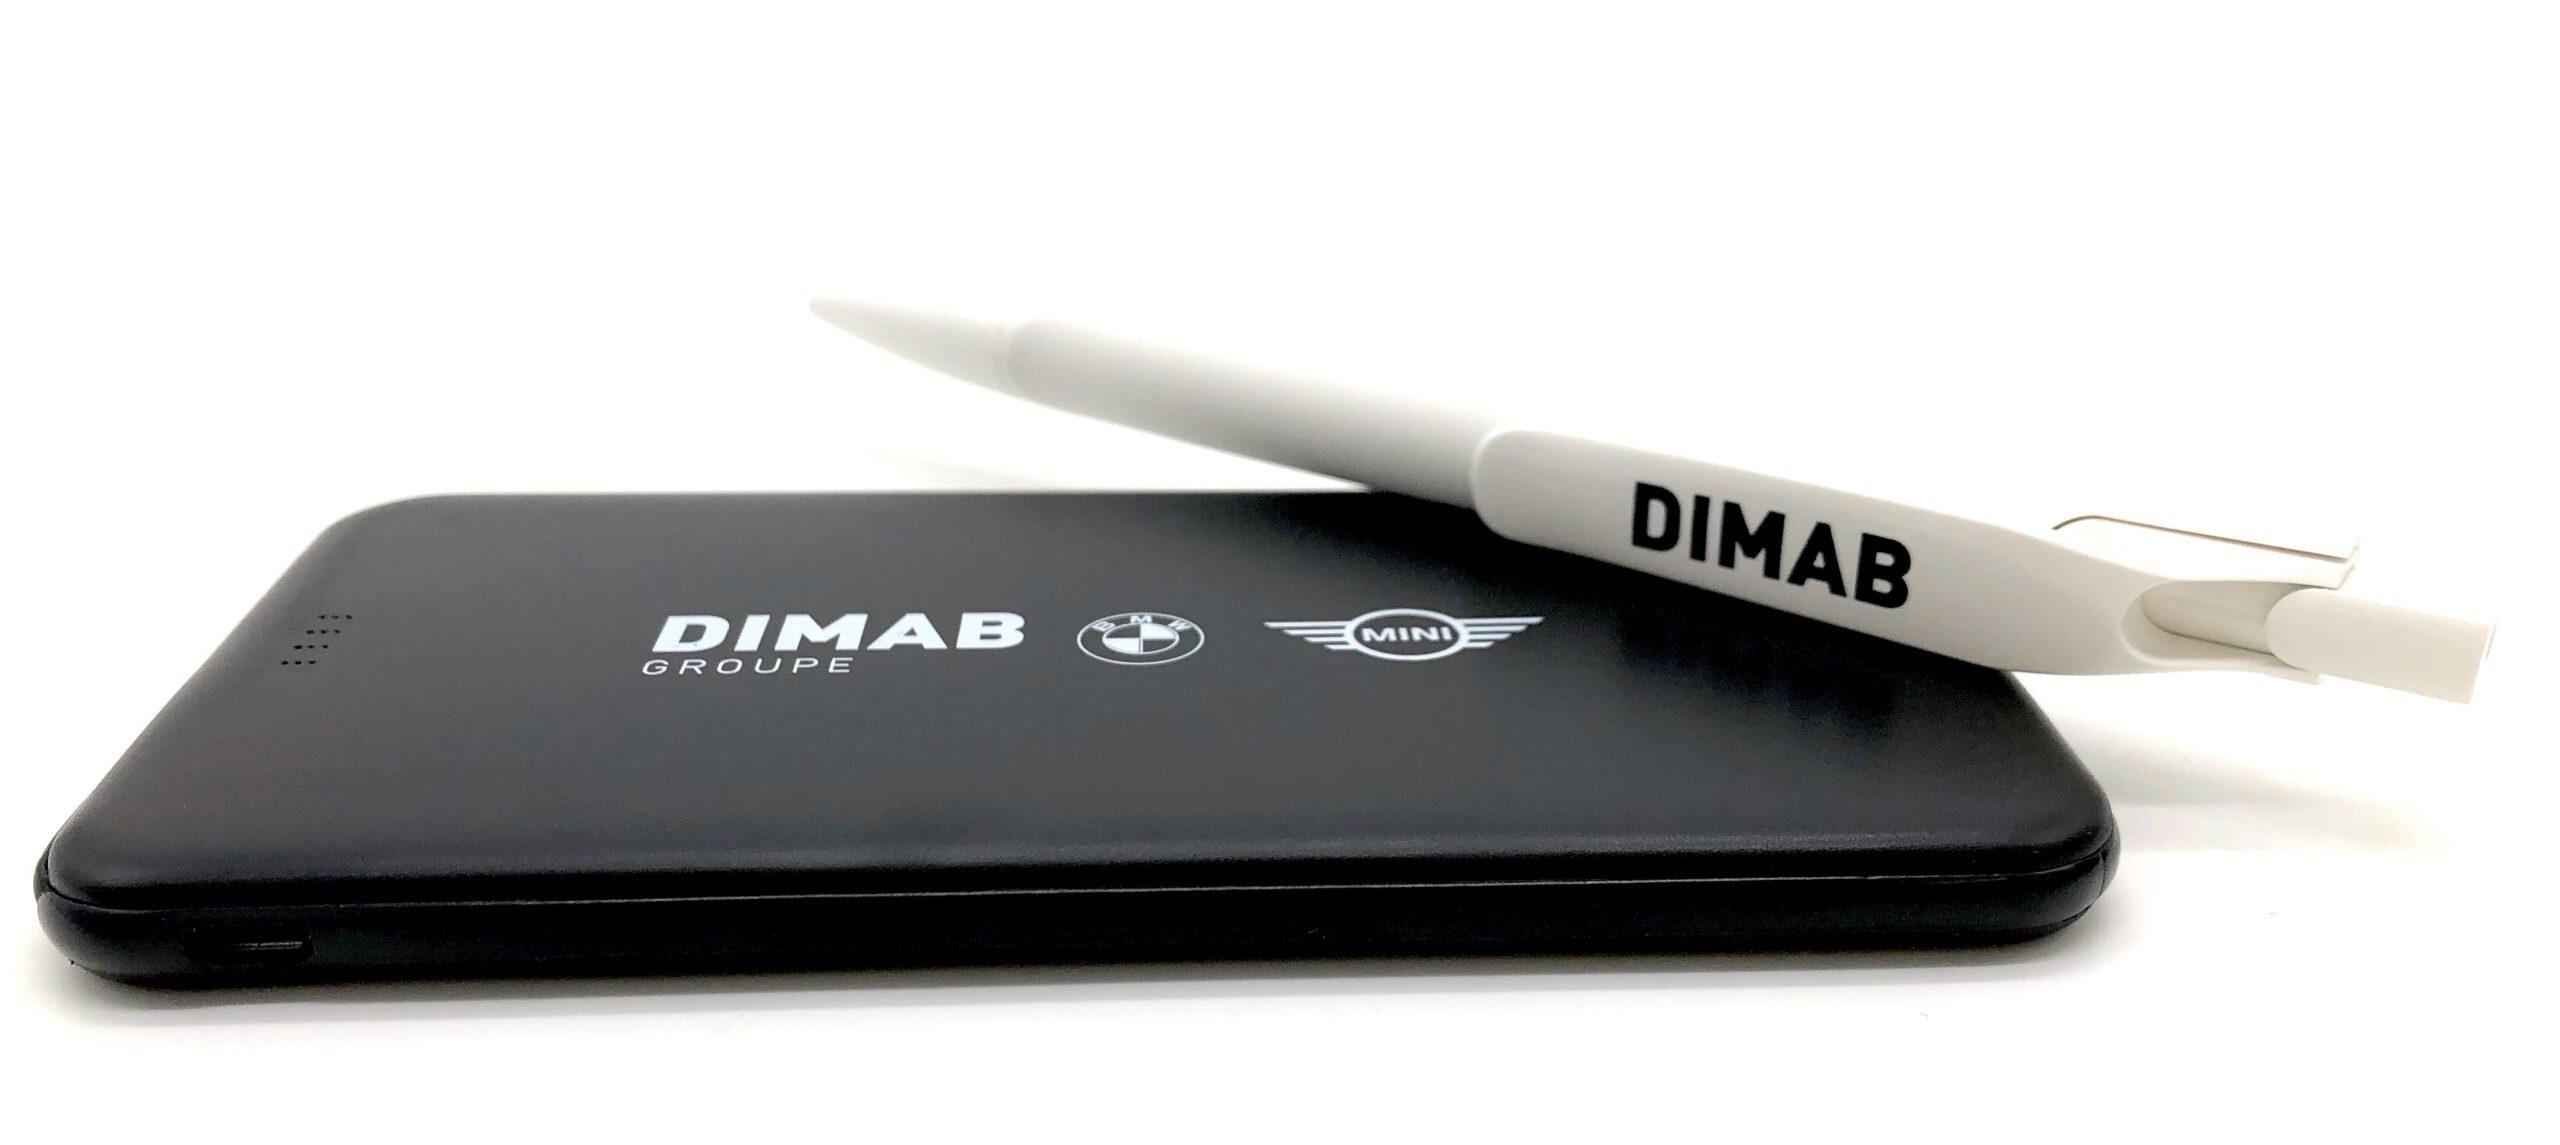 Powerbank et Stylo DIMAB - Technologie / Informatique